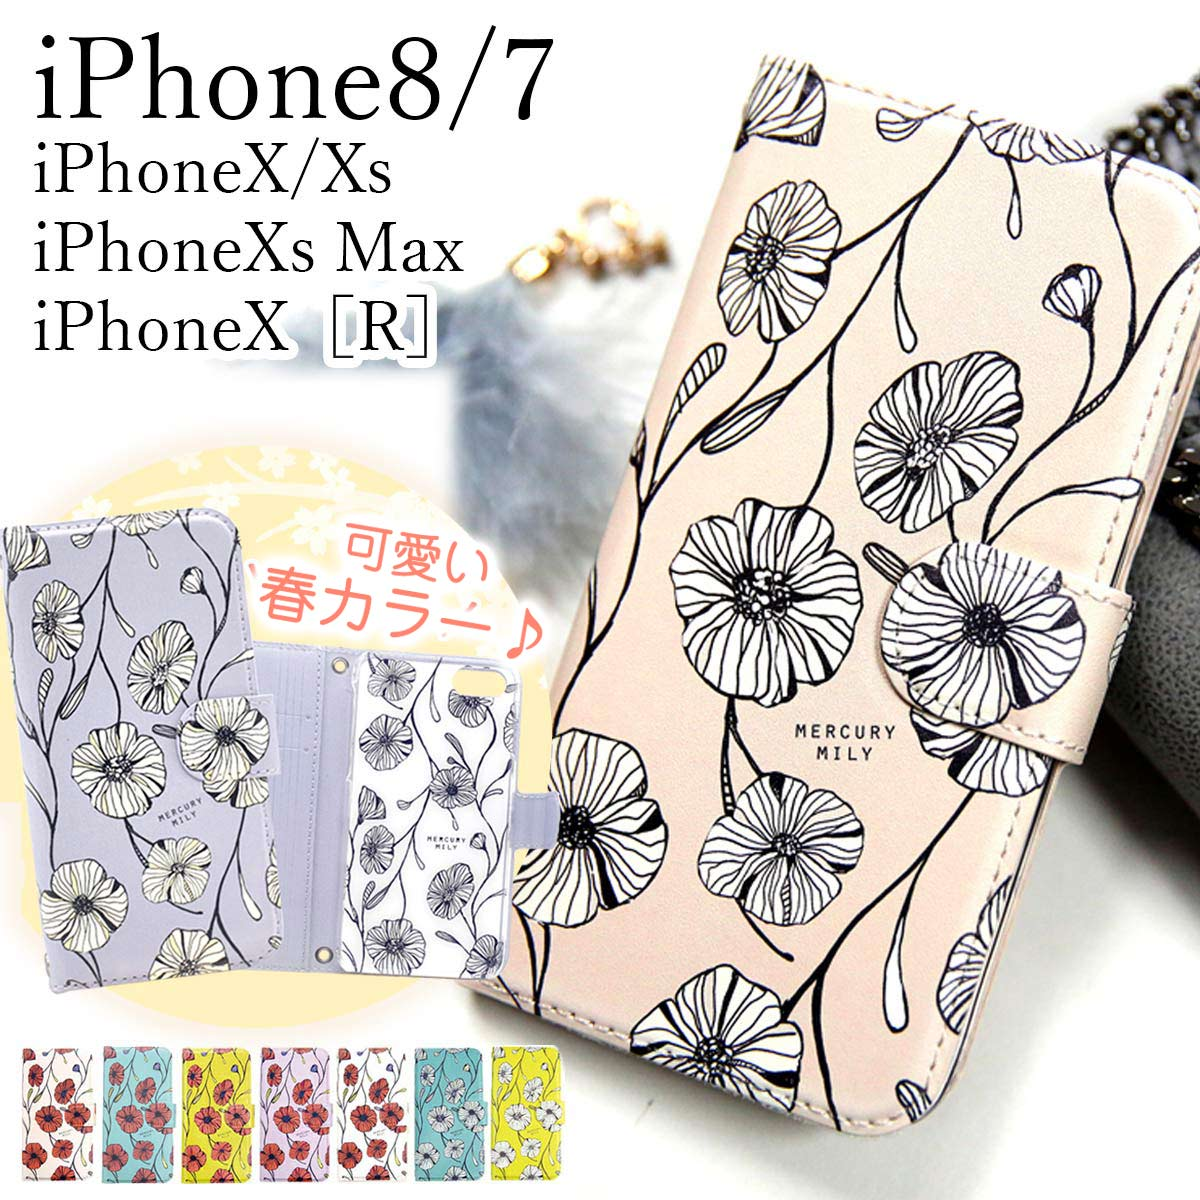 iphoneX 手帳型 かわいい iphone7 iphone8 ケース iPhone se ポピー花柄 手帳ケース iPhone6s plus iPhone12 max Plus ケース手帳型 令和最初にほしいモノ 最新 iPhone7 アイフォン7 令和 手帳型ケース 今季も再入荷 mini pro iPhone5 カバ